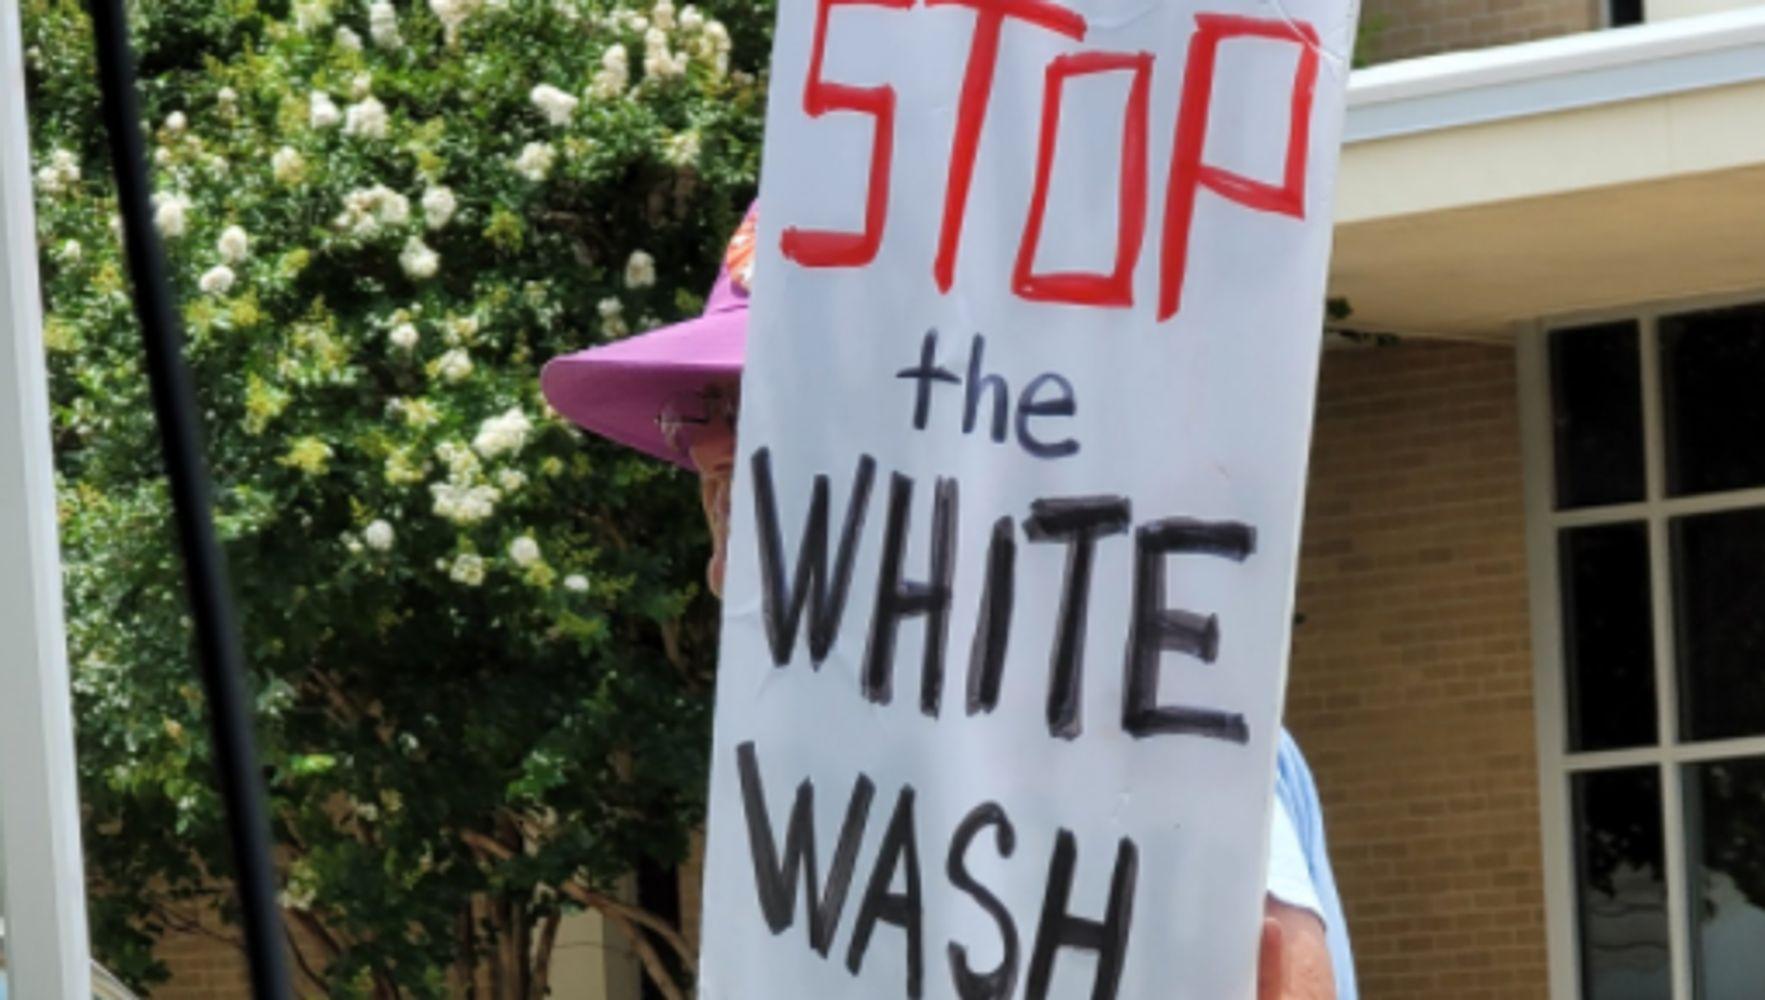 Teachers Say GOP's Critical Race Theory Bills 'Whitewash American History'